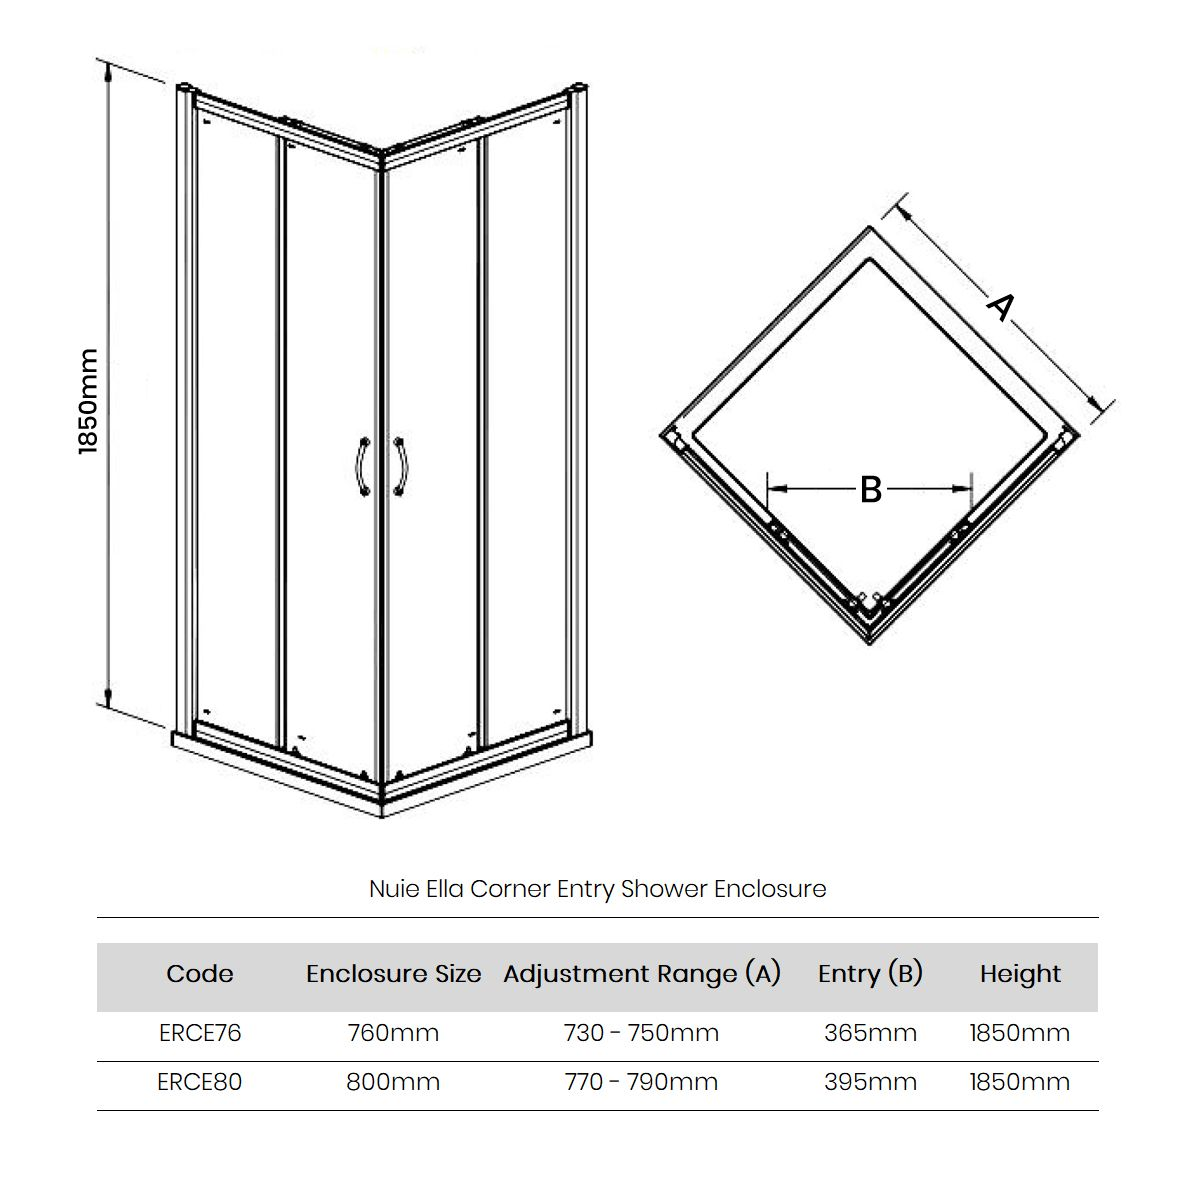 Premier Ella Corner Entry Shower Enclosure Dimensions